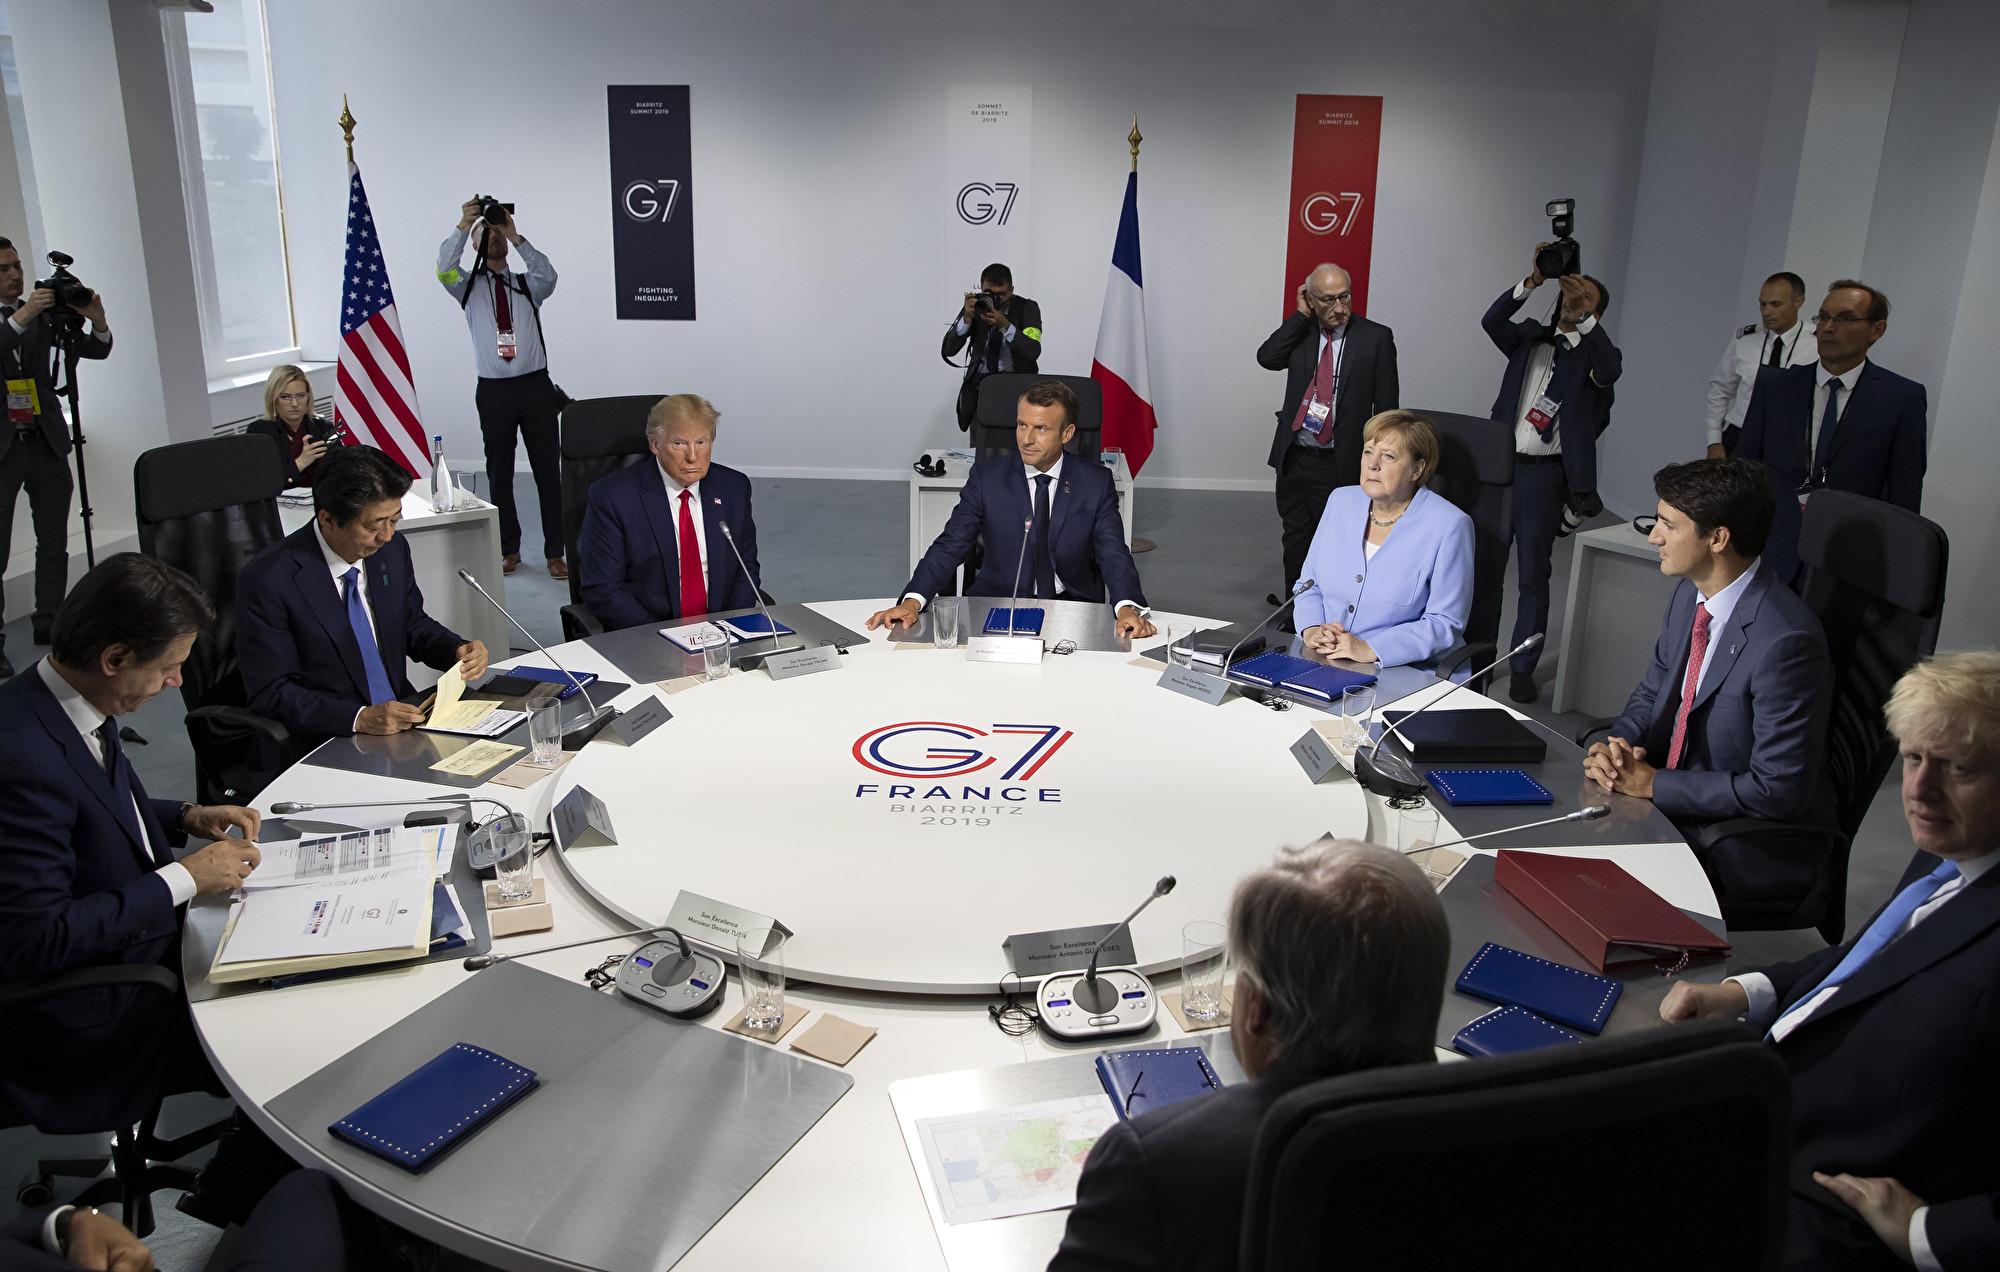 G7峰會挺香港:中英聯合聲明存在且重要